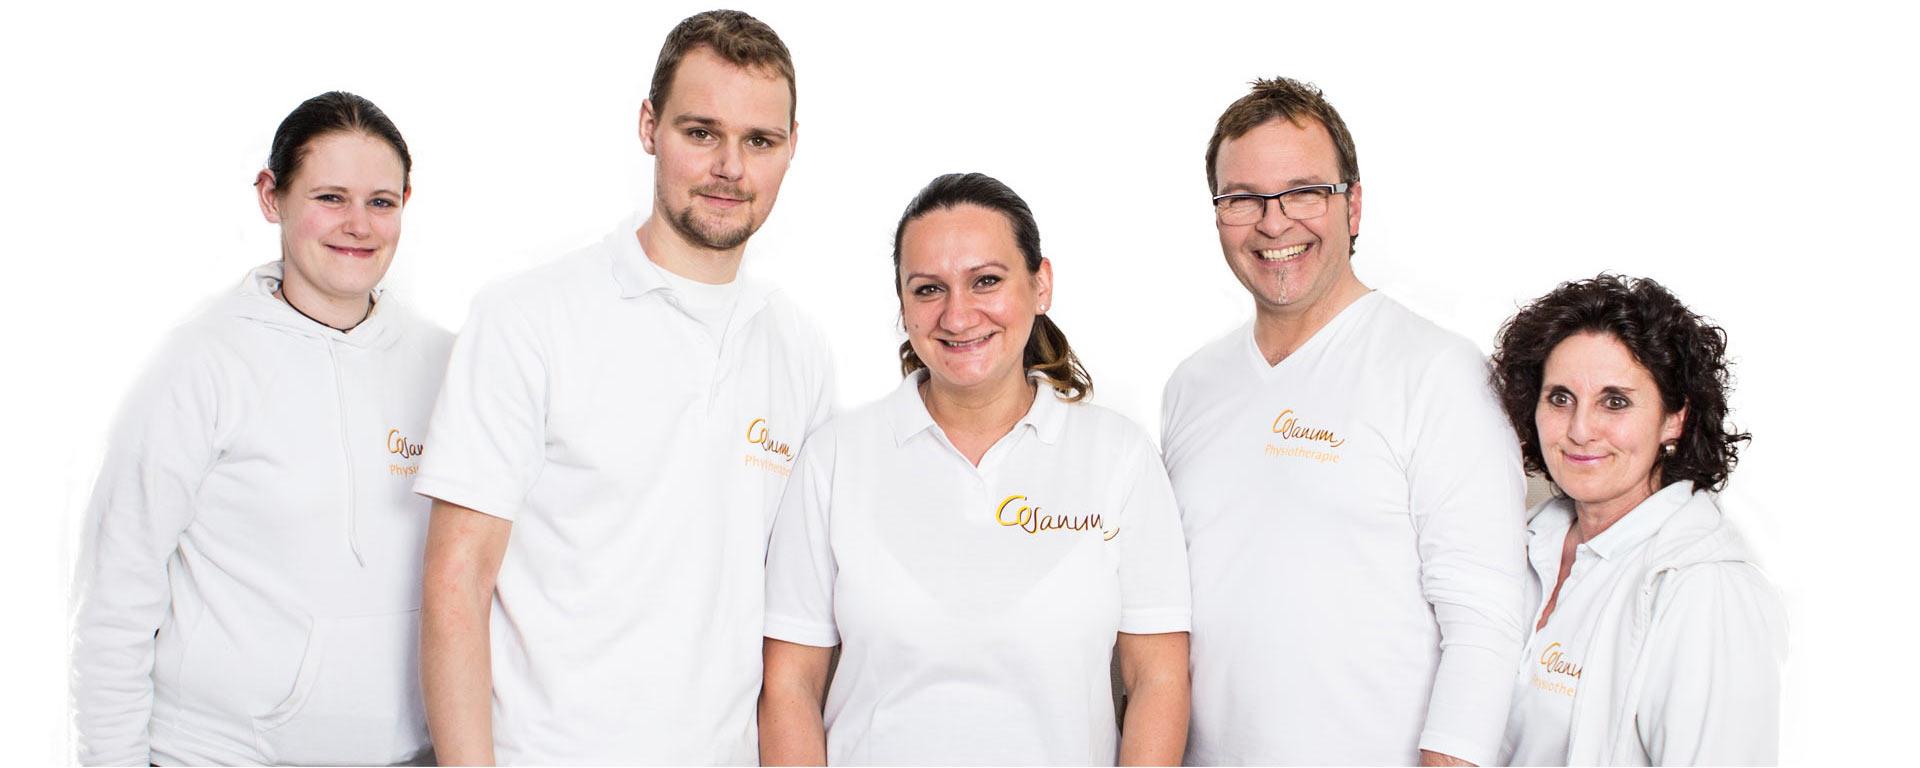 Das Praxisteam Cosanum Wuppertal